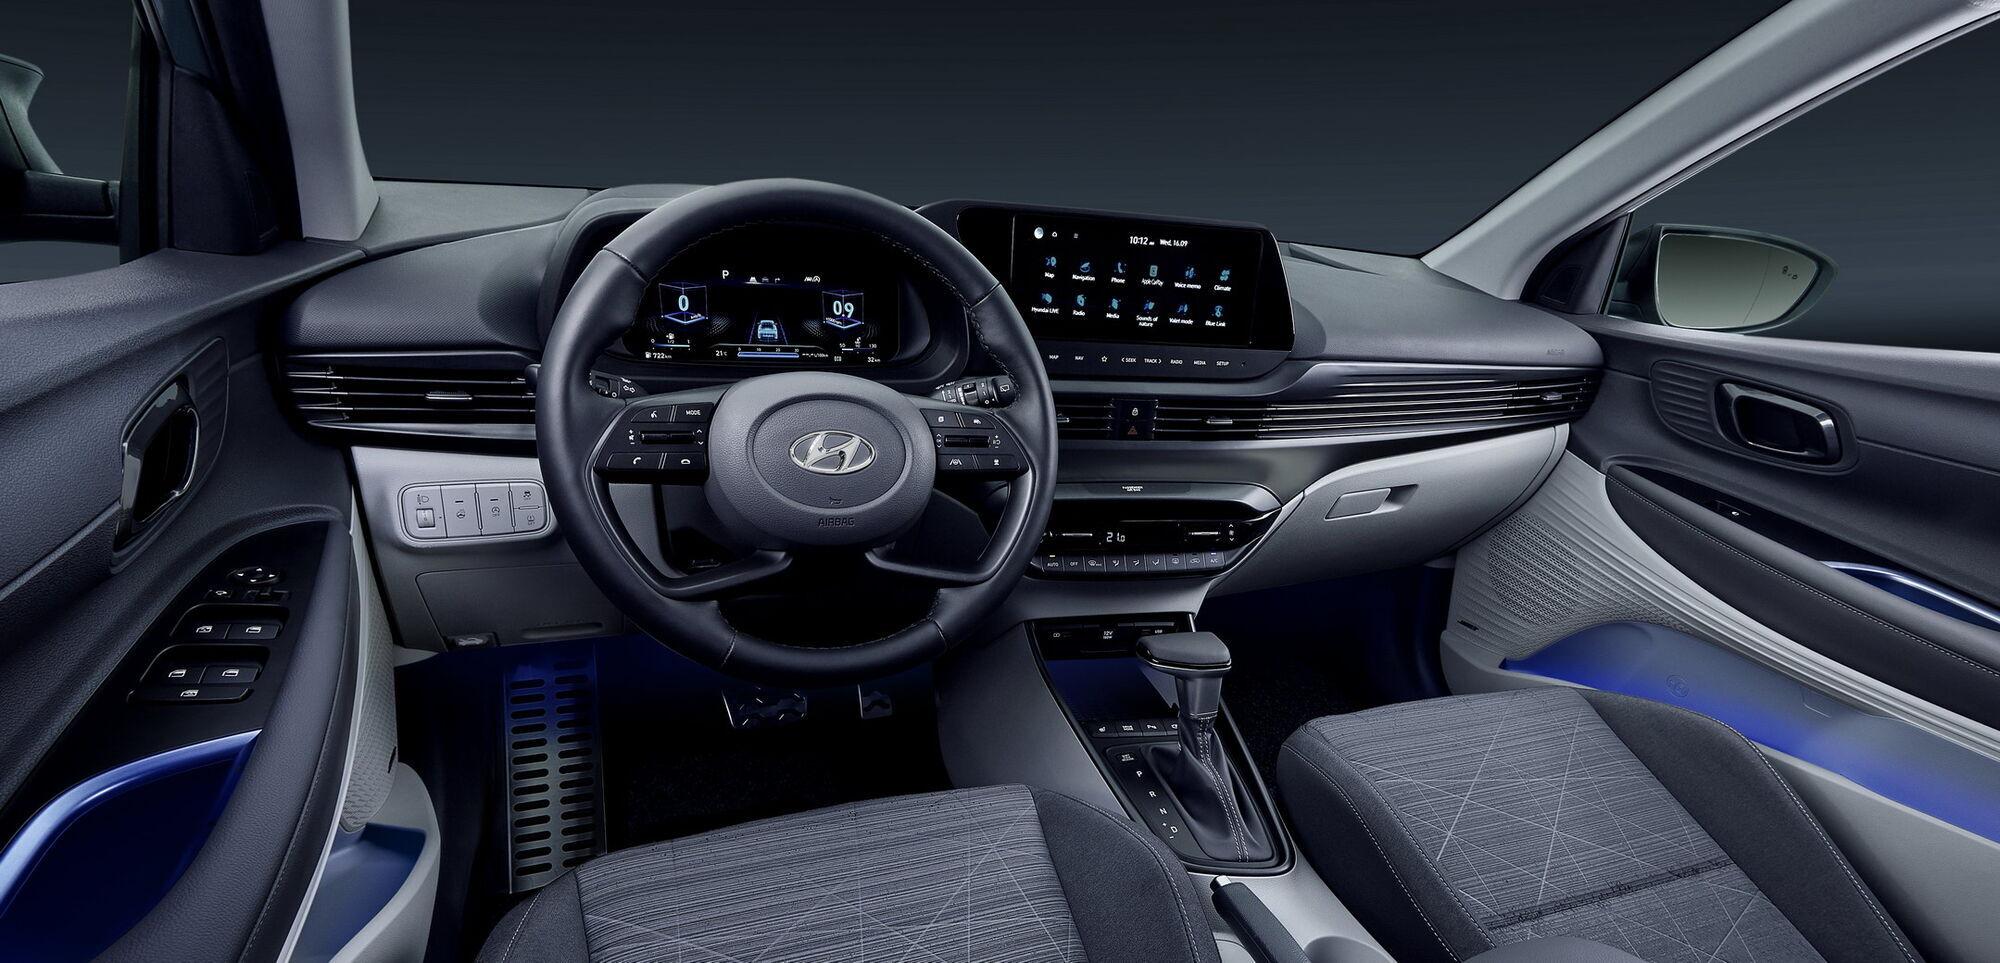 Салон компактного кроссовера Hyundai Bayon